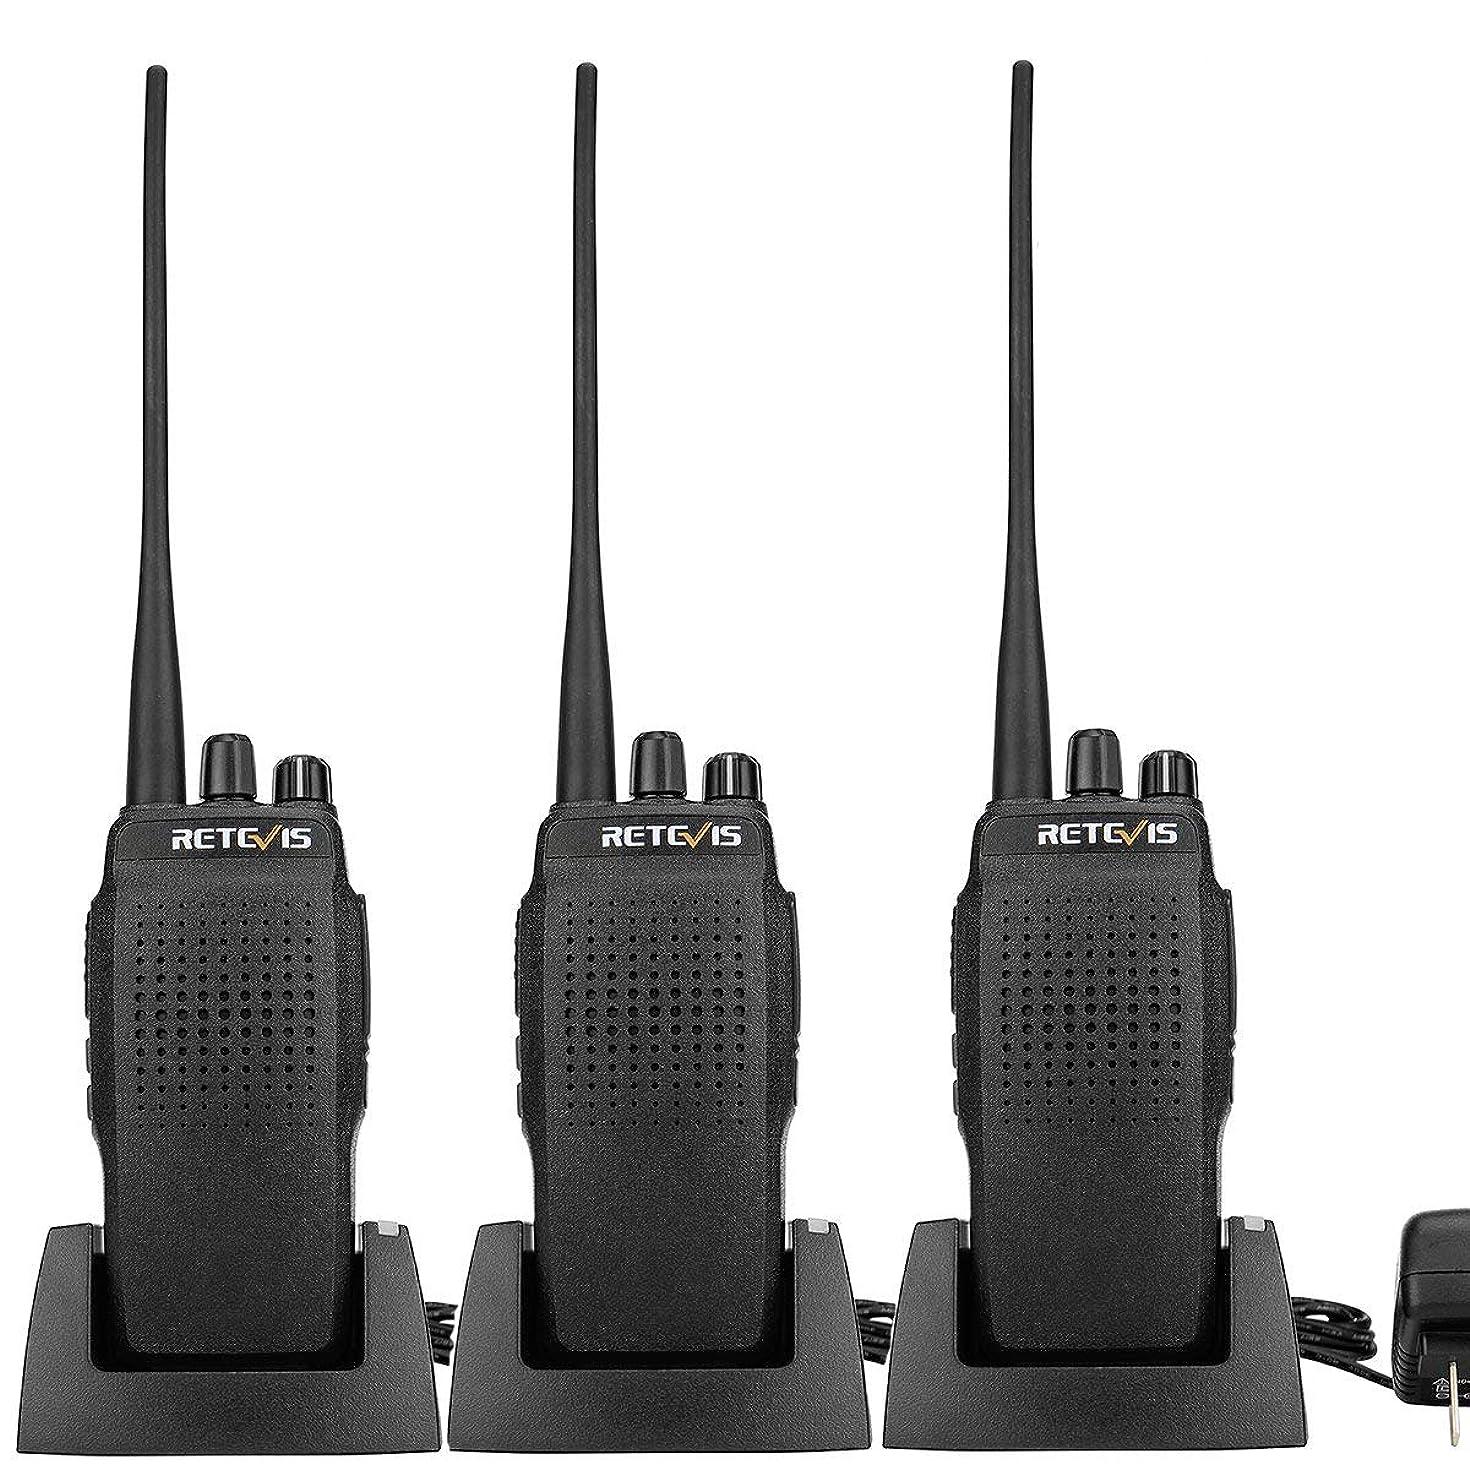 Retevis RT26 Two Way Radios High Power 3000 mAh Walkie Talkie UHF Long Range Sturdy Police Radio Hands Free Scan Handheld Transceiver(3 Pack)